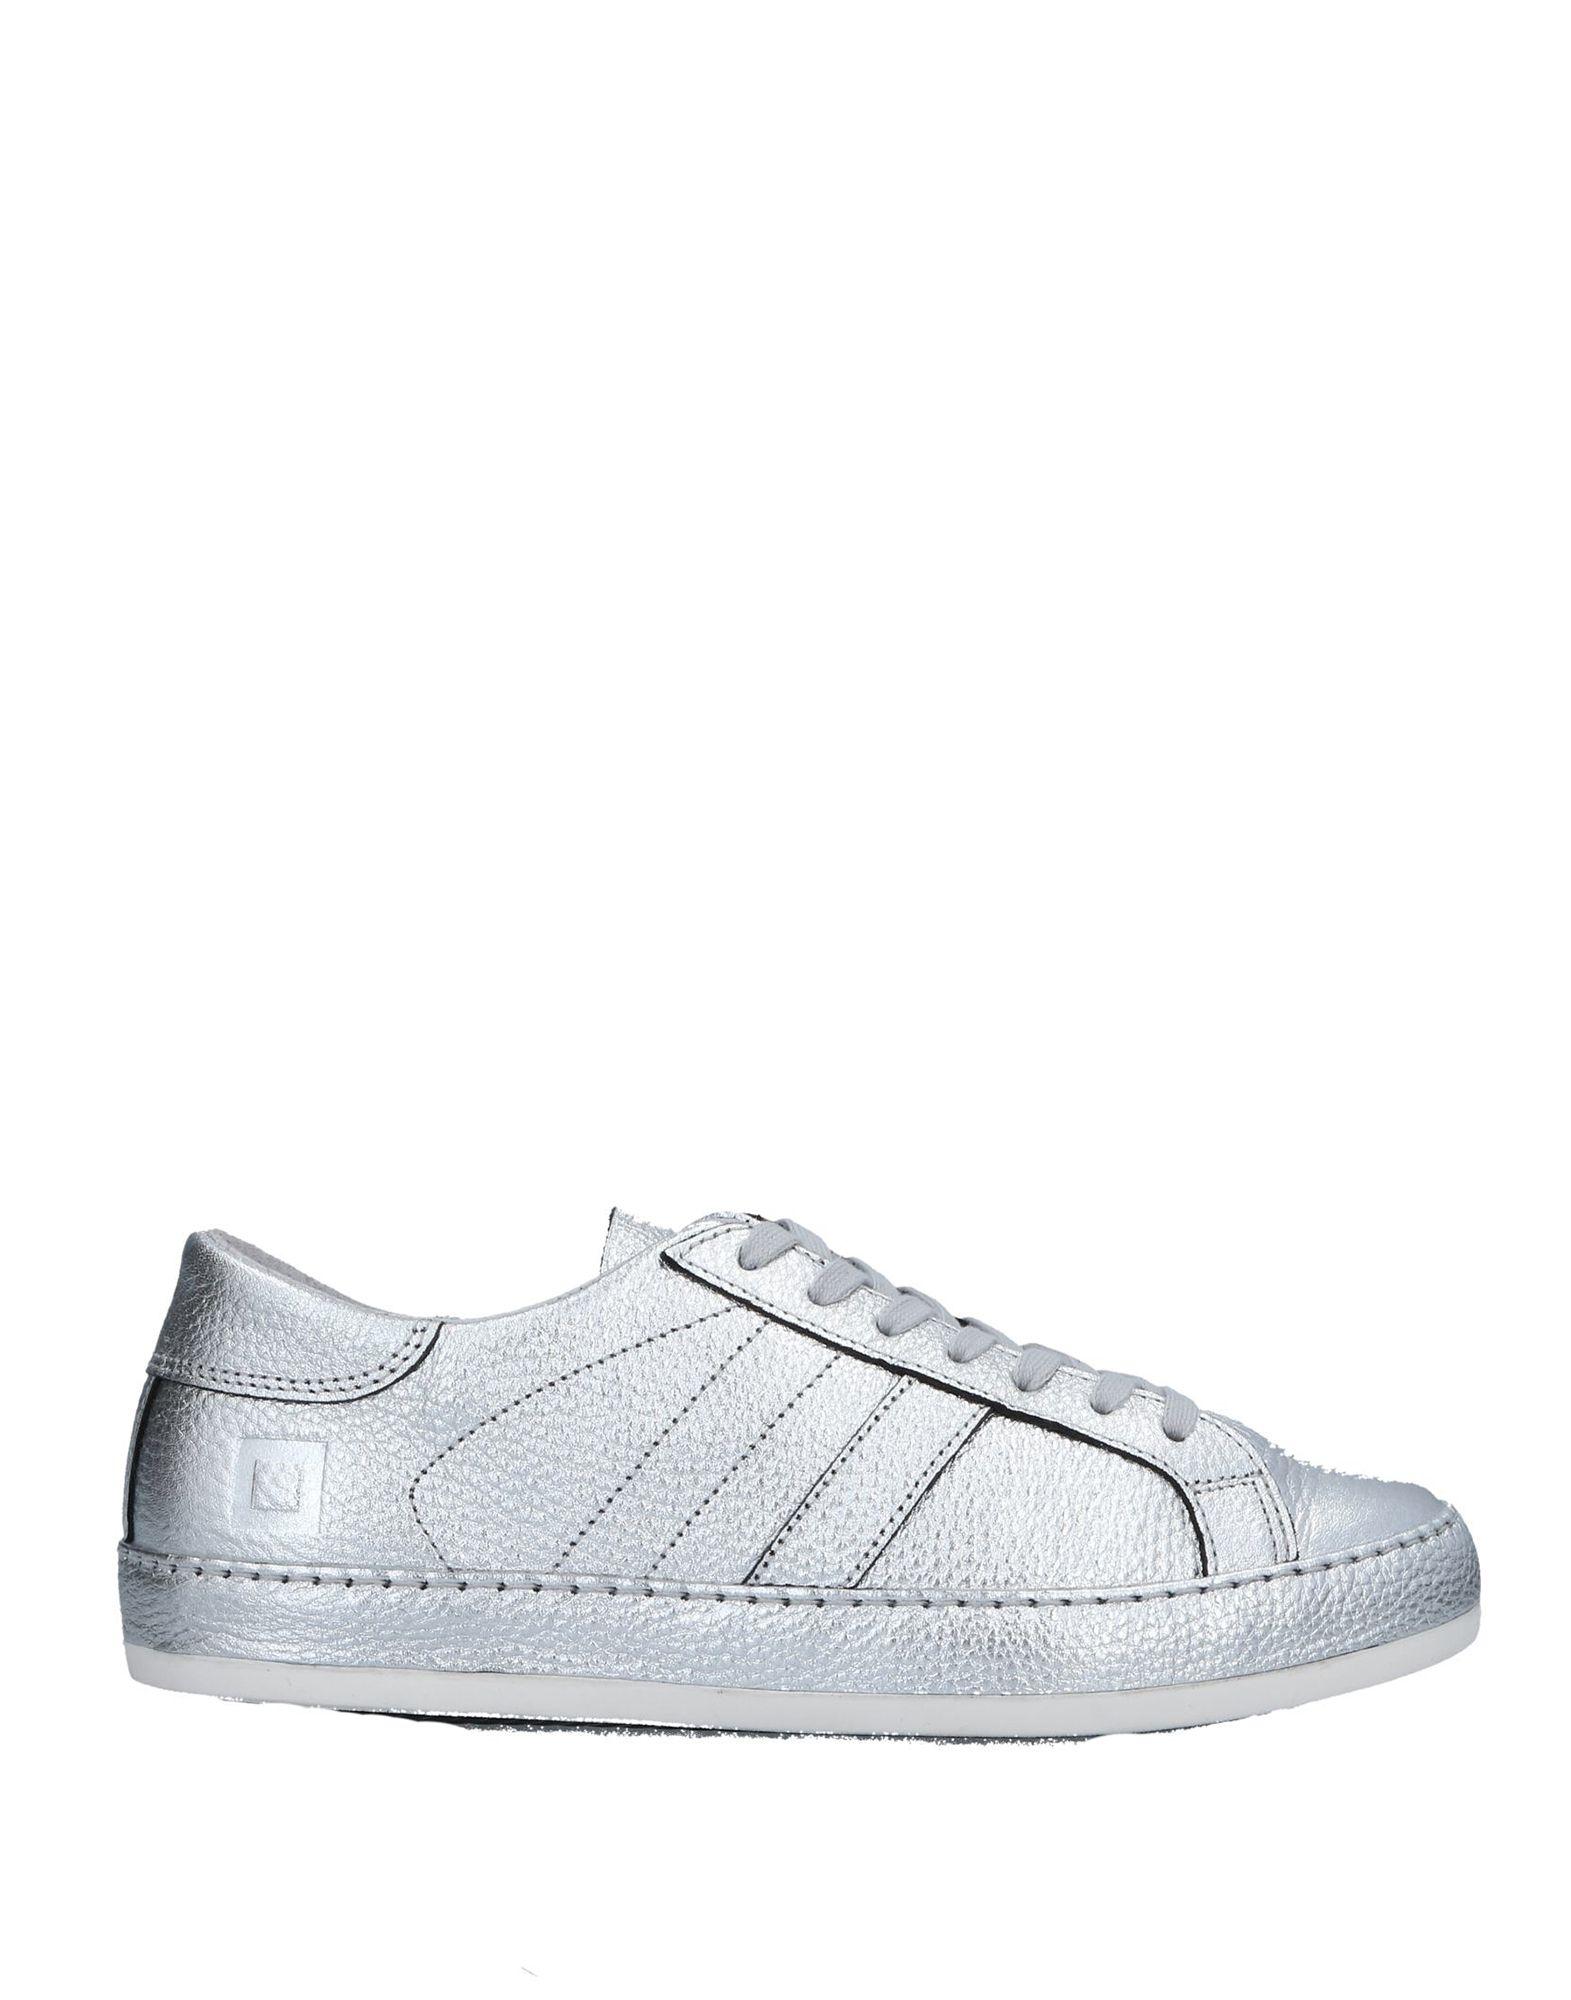 Moda Sneakers D.A.T.E. Donna - 11532838GK